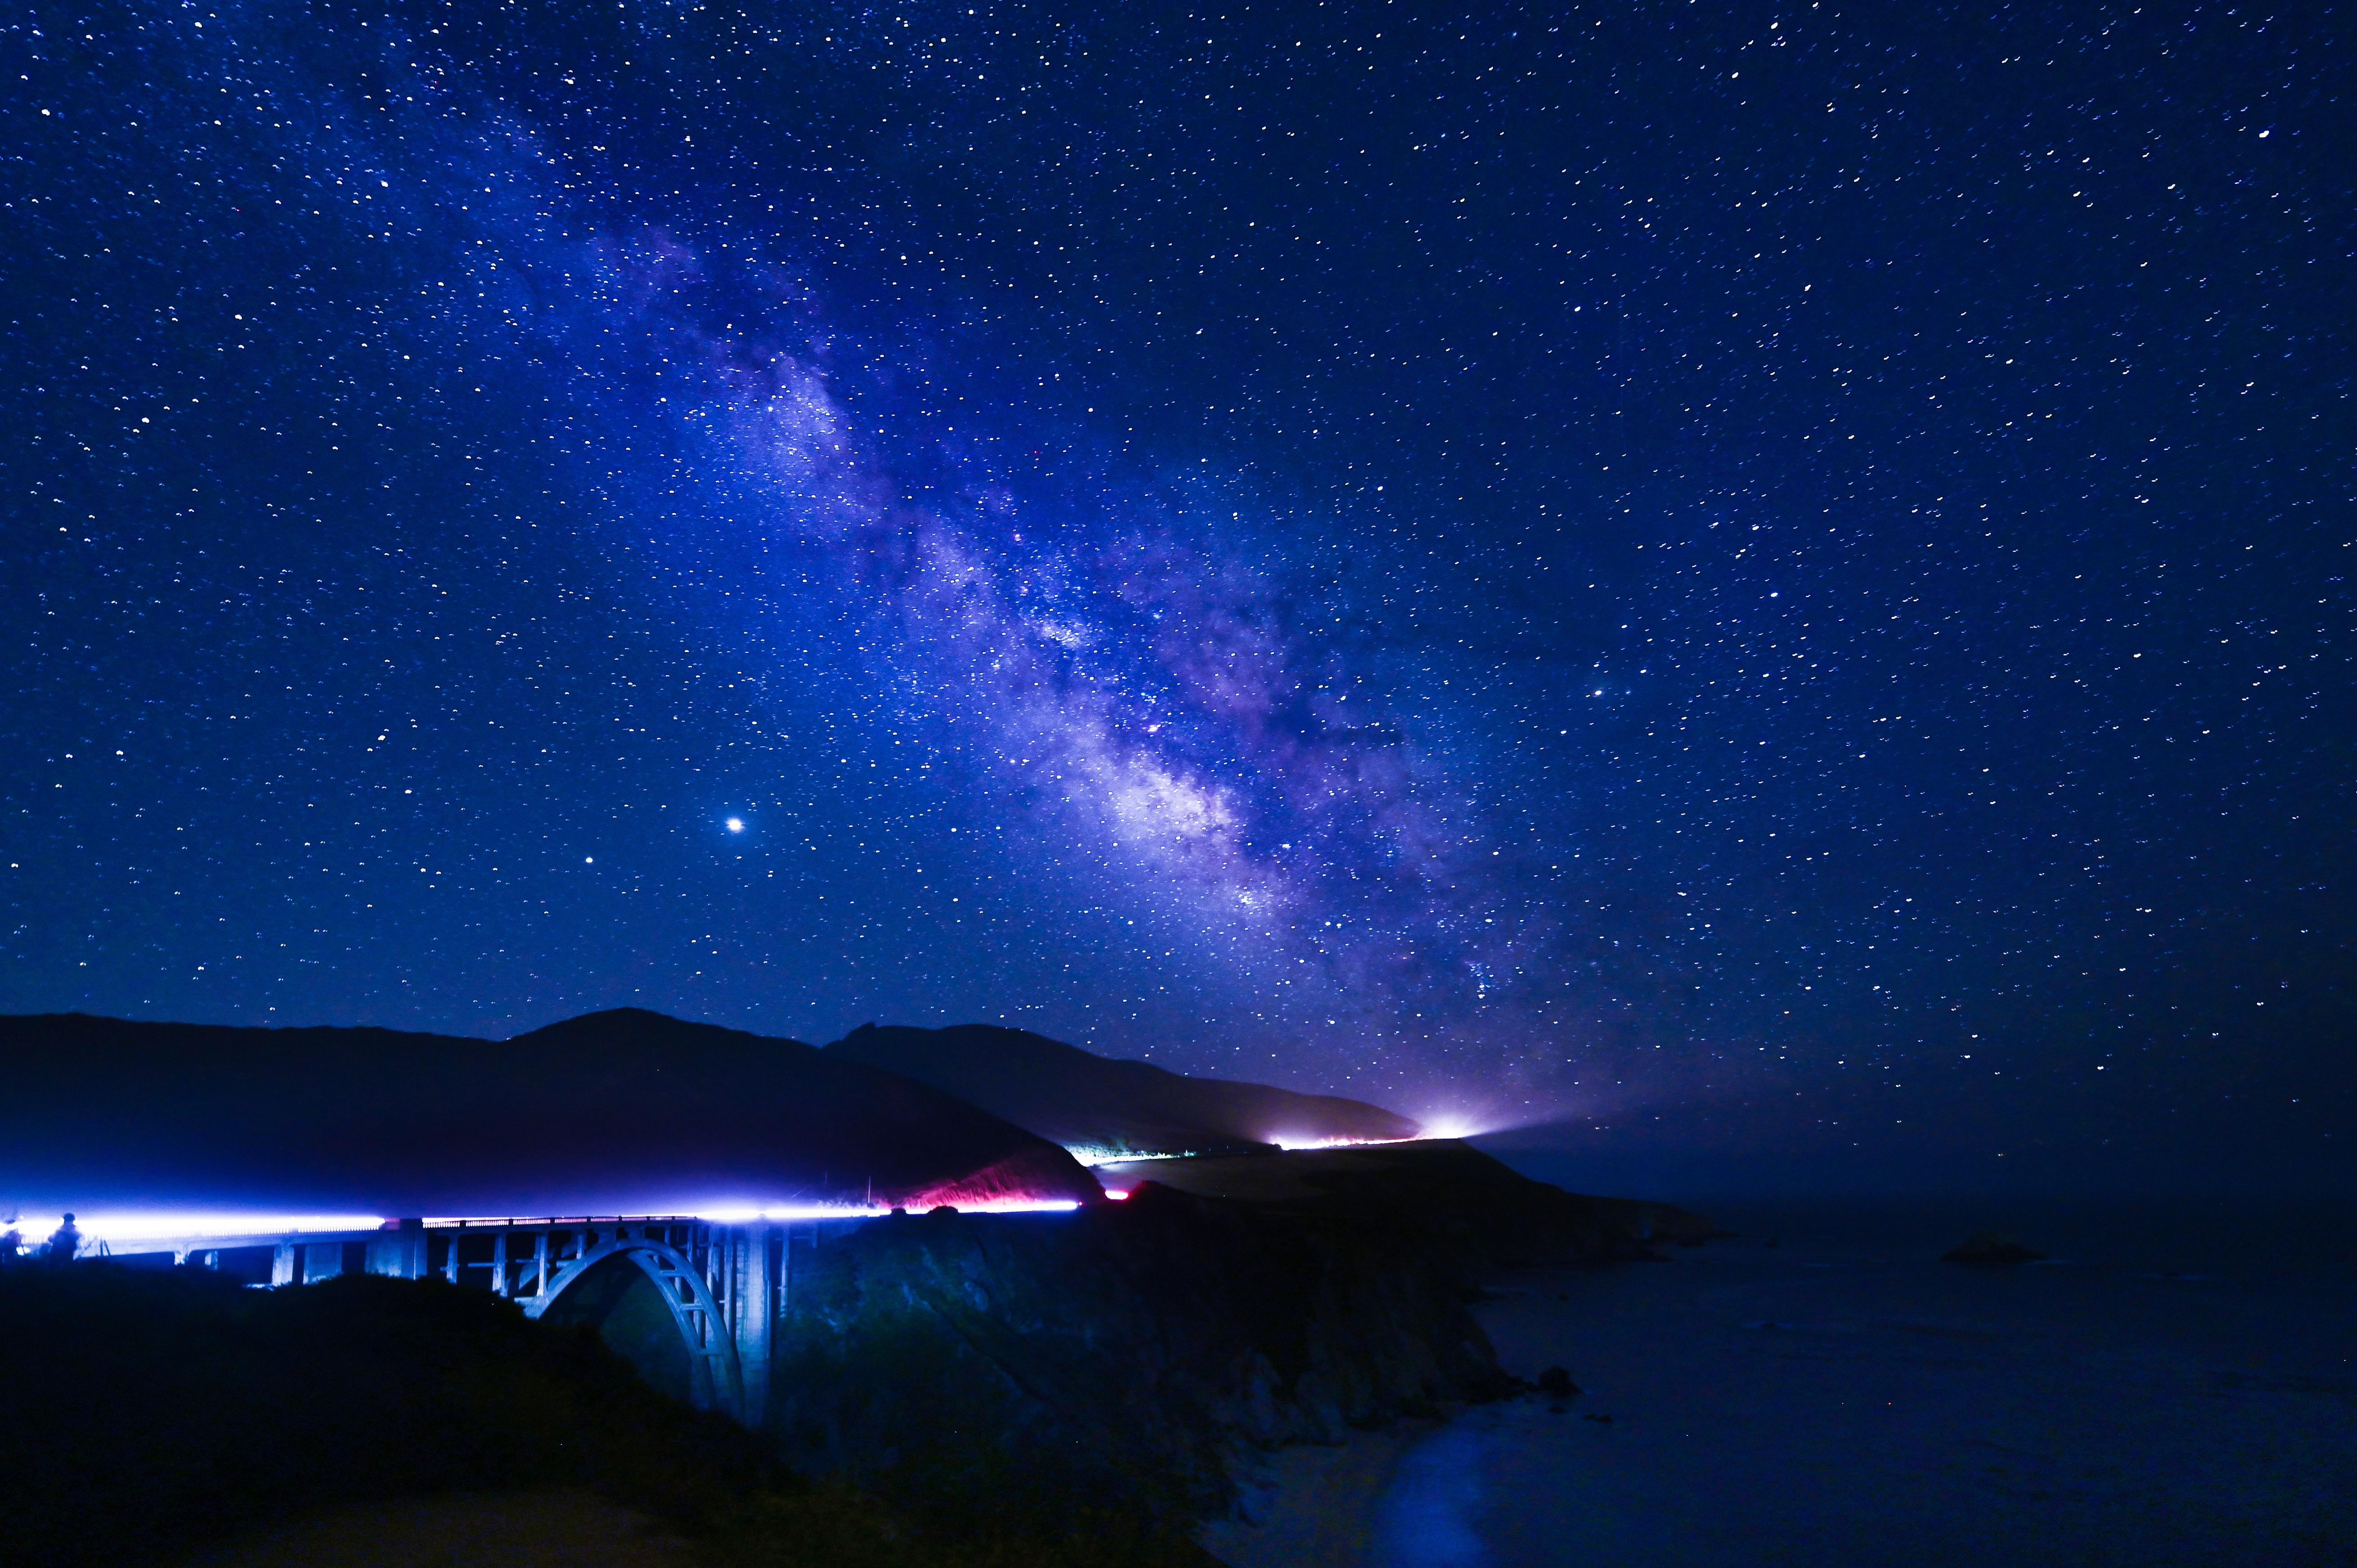 57555 download wallpaper Bridges, Night, Dark, Hills, Nebula, Neon, Glow screensavers and pictures for free